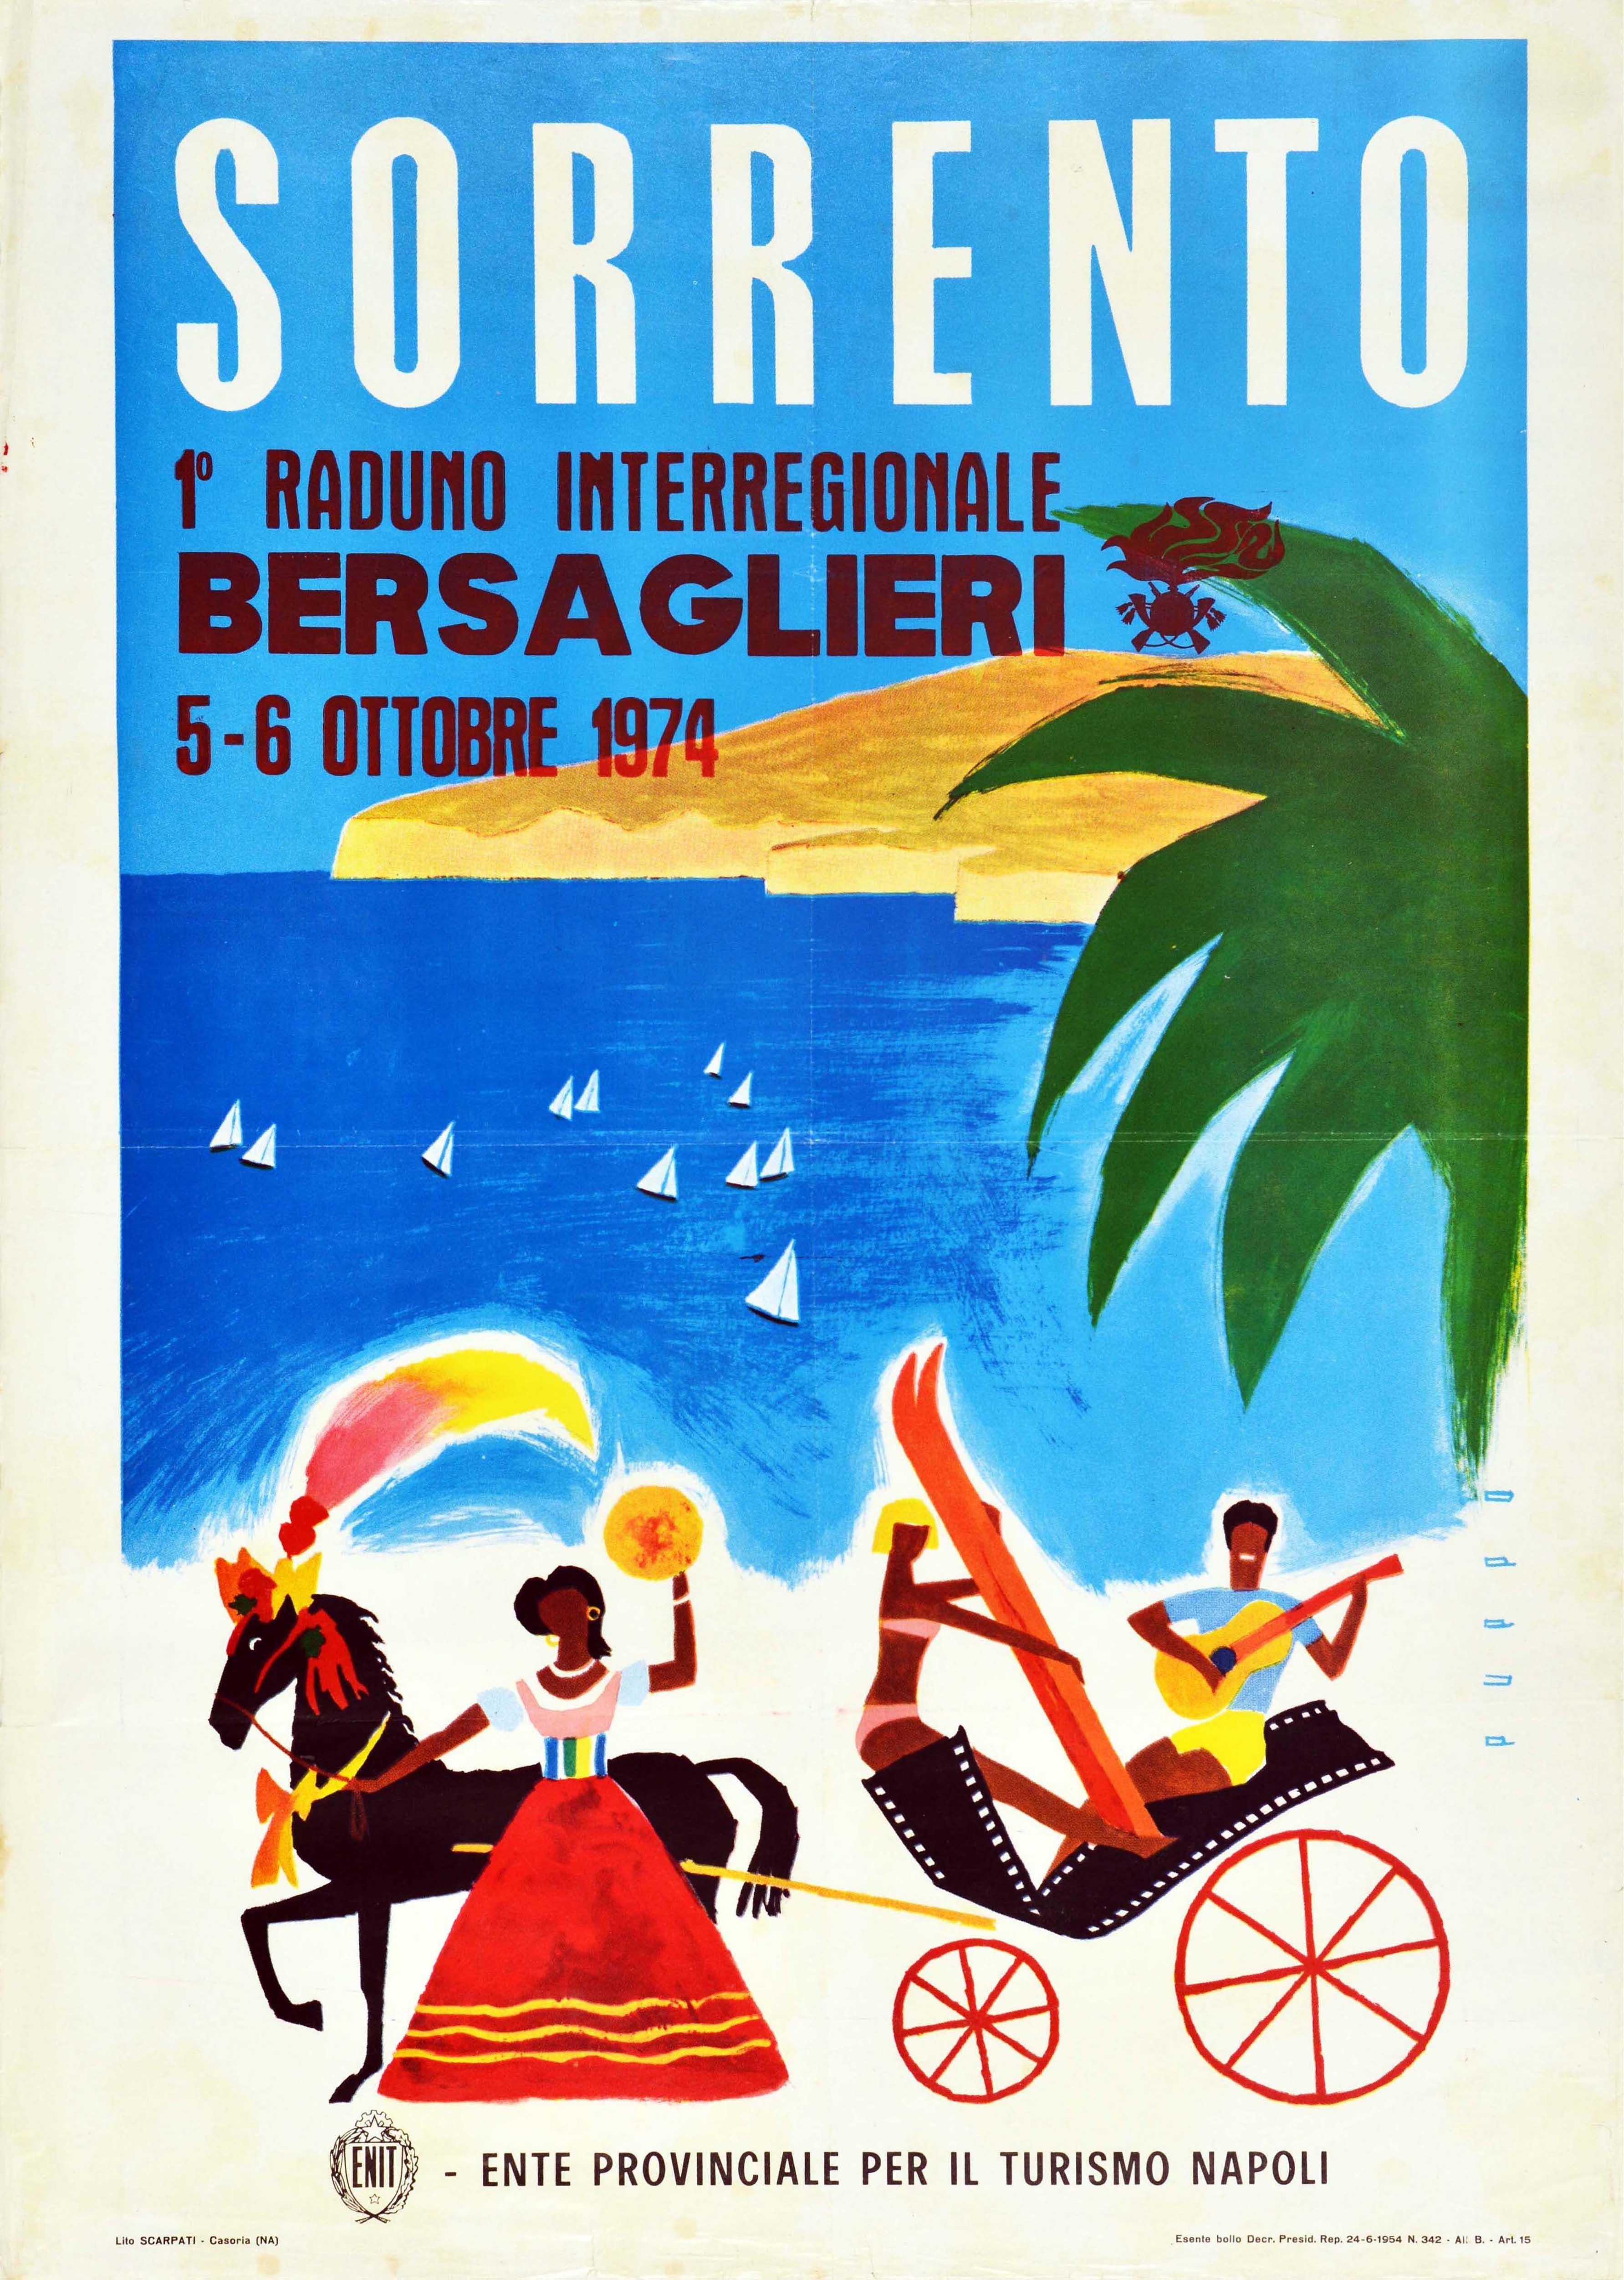 Original Vintage Poster Sorrento Italy ENIT Travel Naples Bersaglieri Reunion